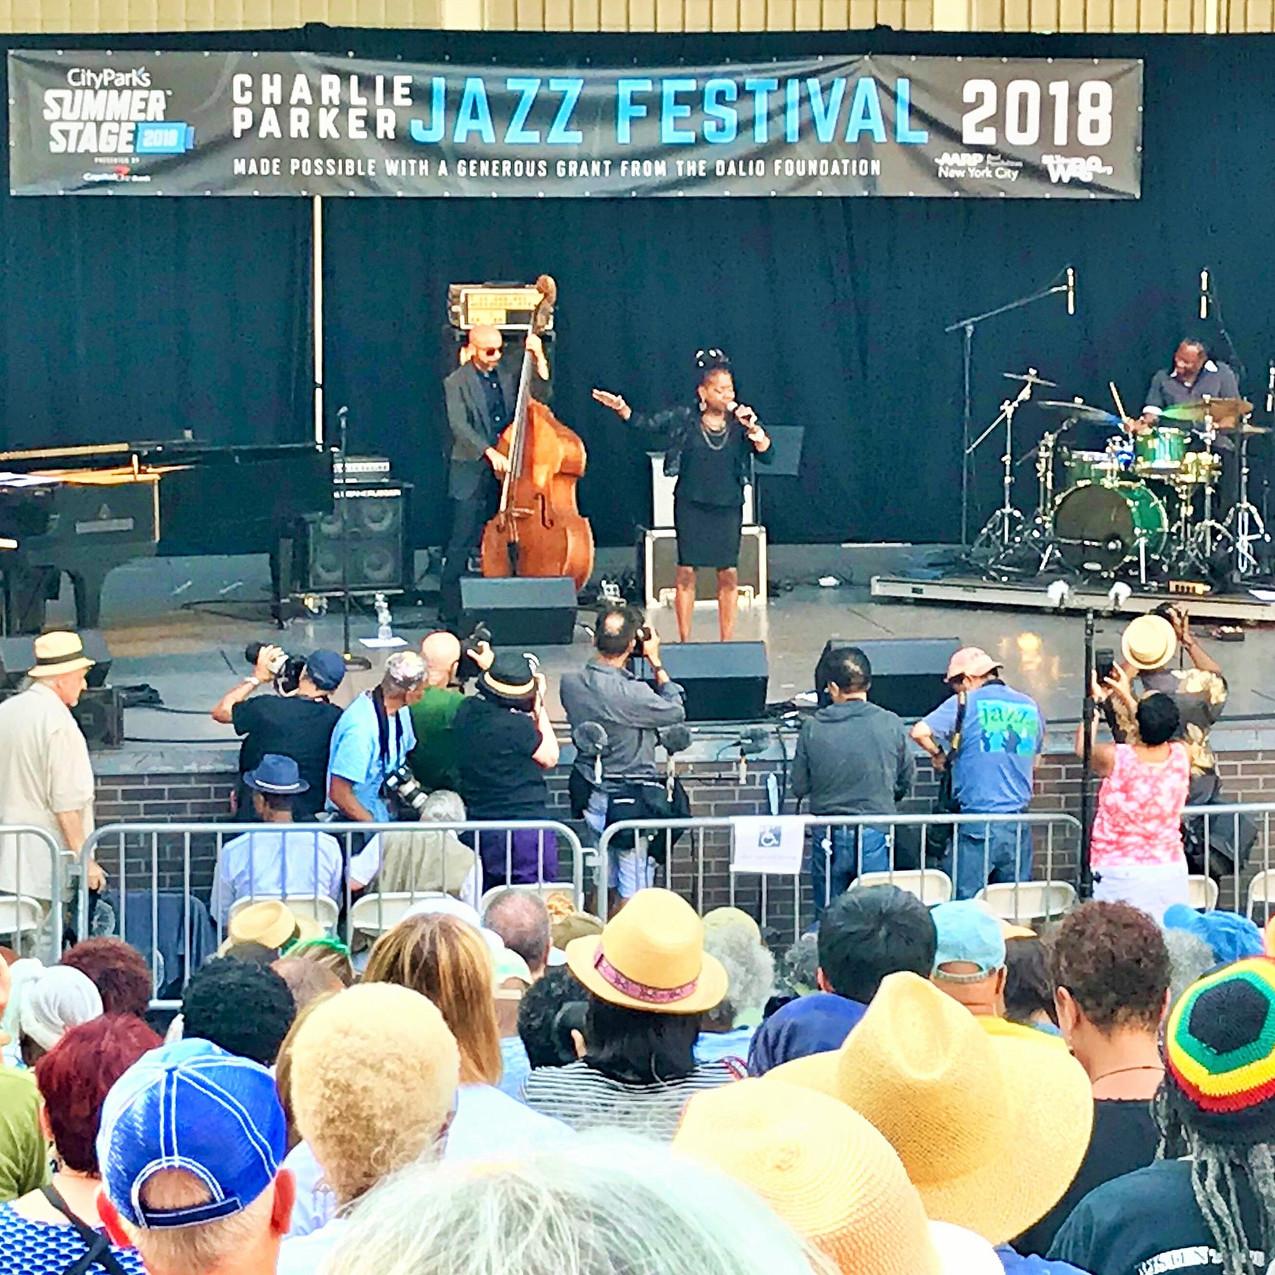 Annual Charlie Parker Jazz Festival